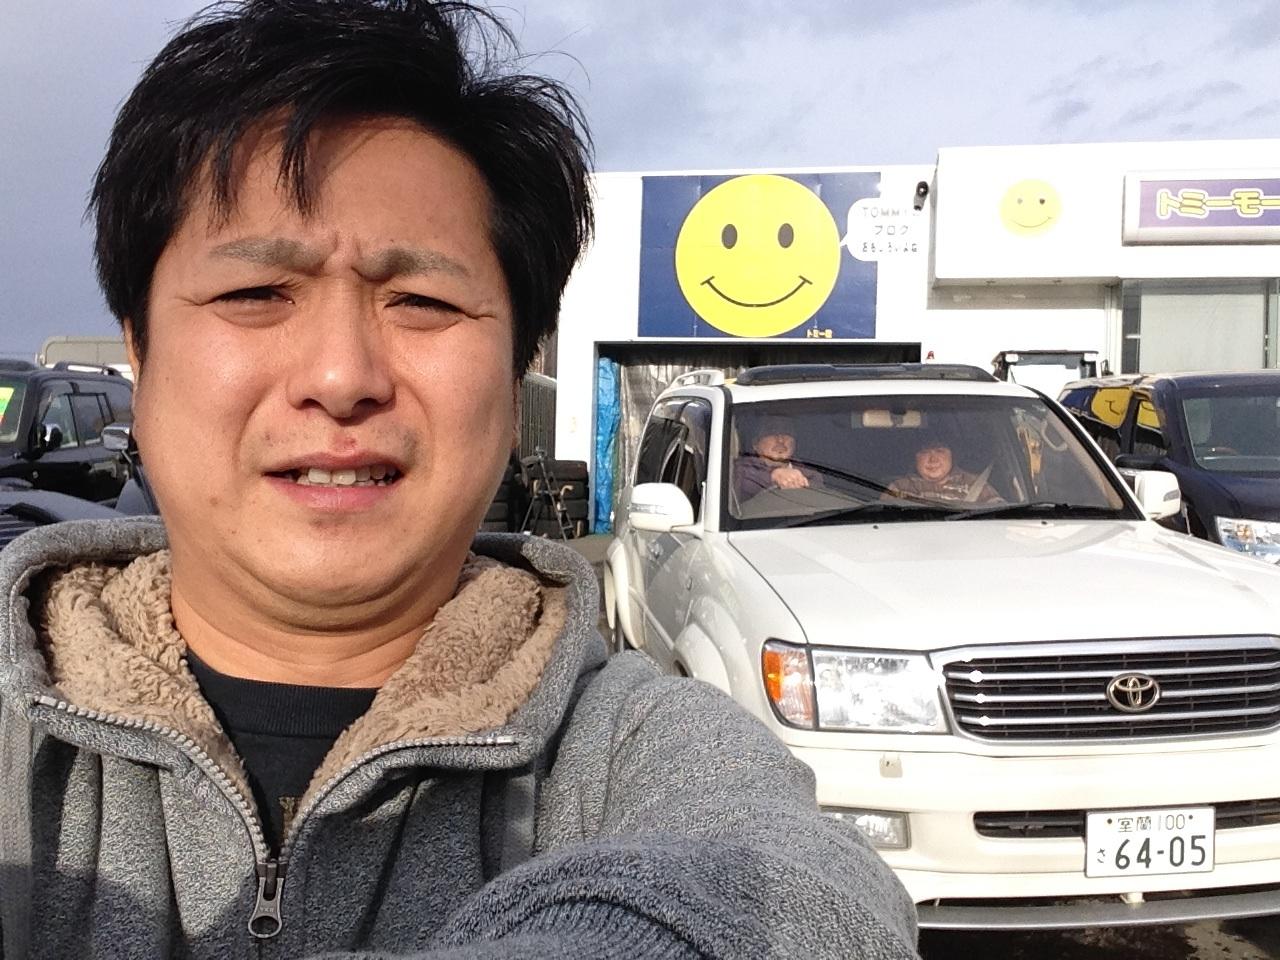 T様シグナス&E様クライスラーご成約~!!阿部ちゃんニコニコブログ★ランクル ハマー アルファード★_b0127002_1833229.jpg